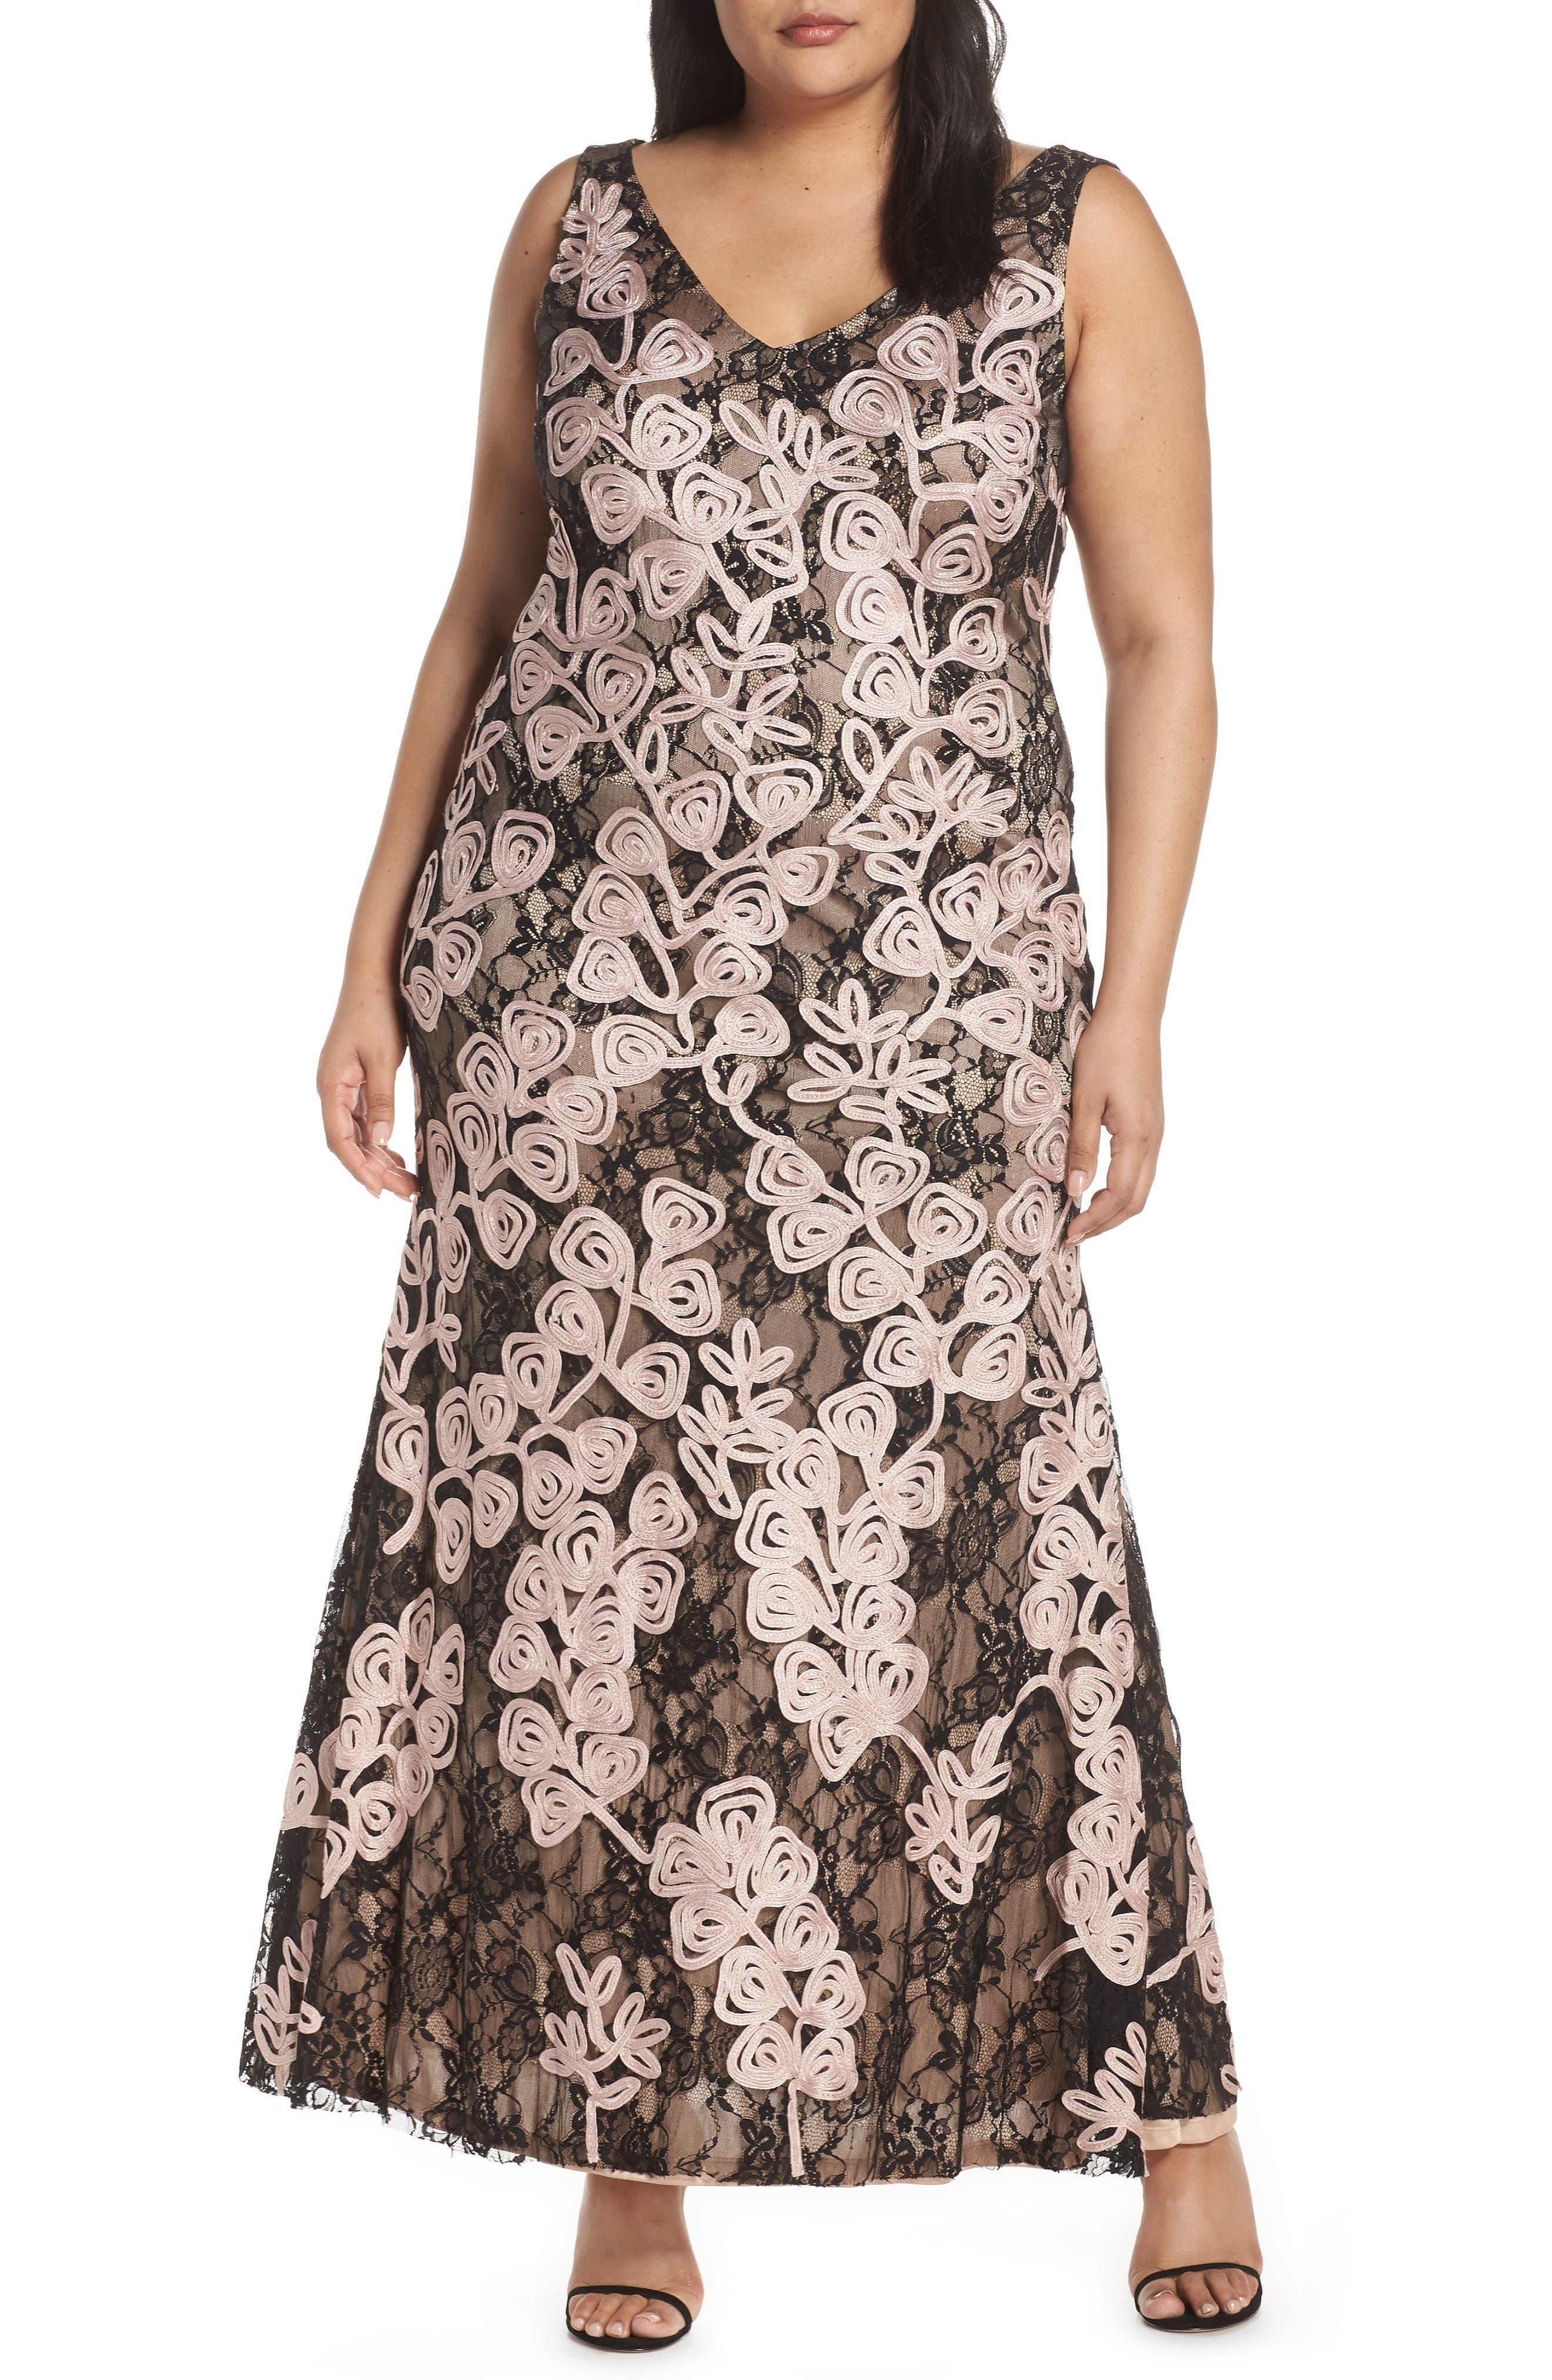 Plus Size Js Collections Soutache Embroidered Lace Evening Dress, Black